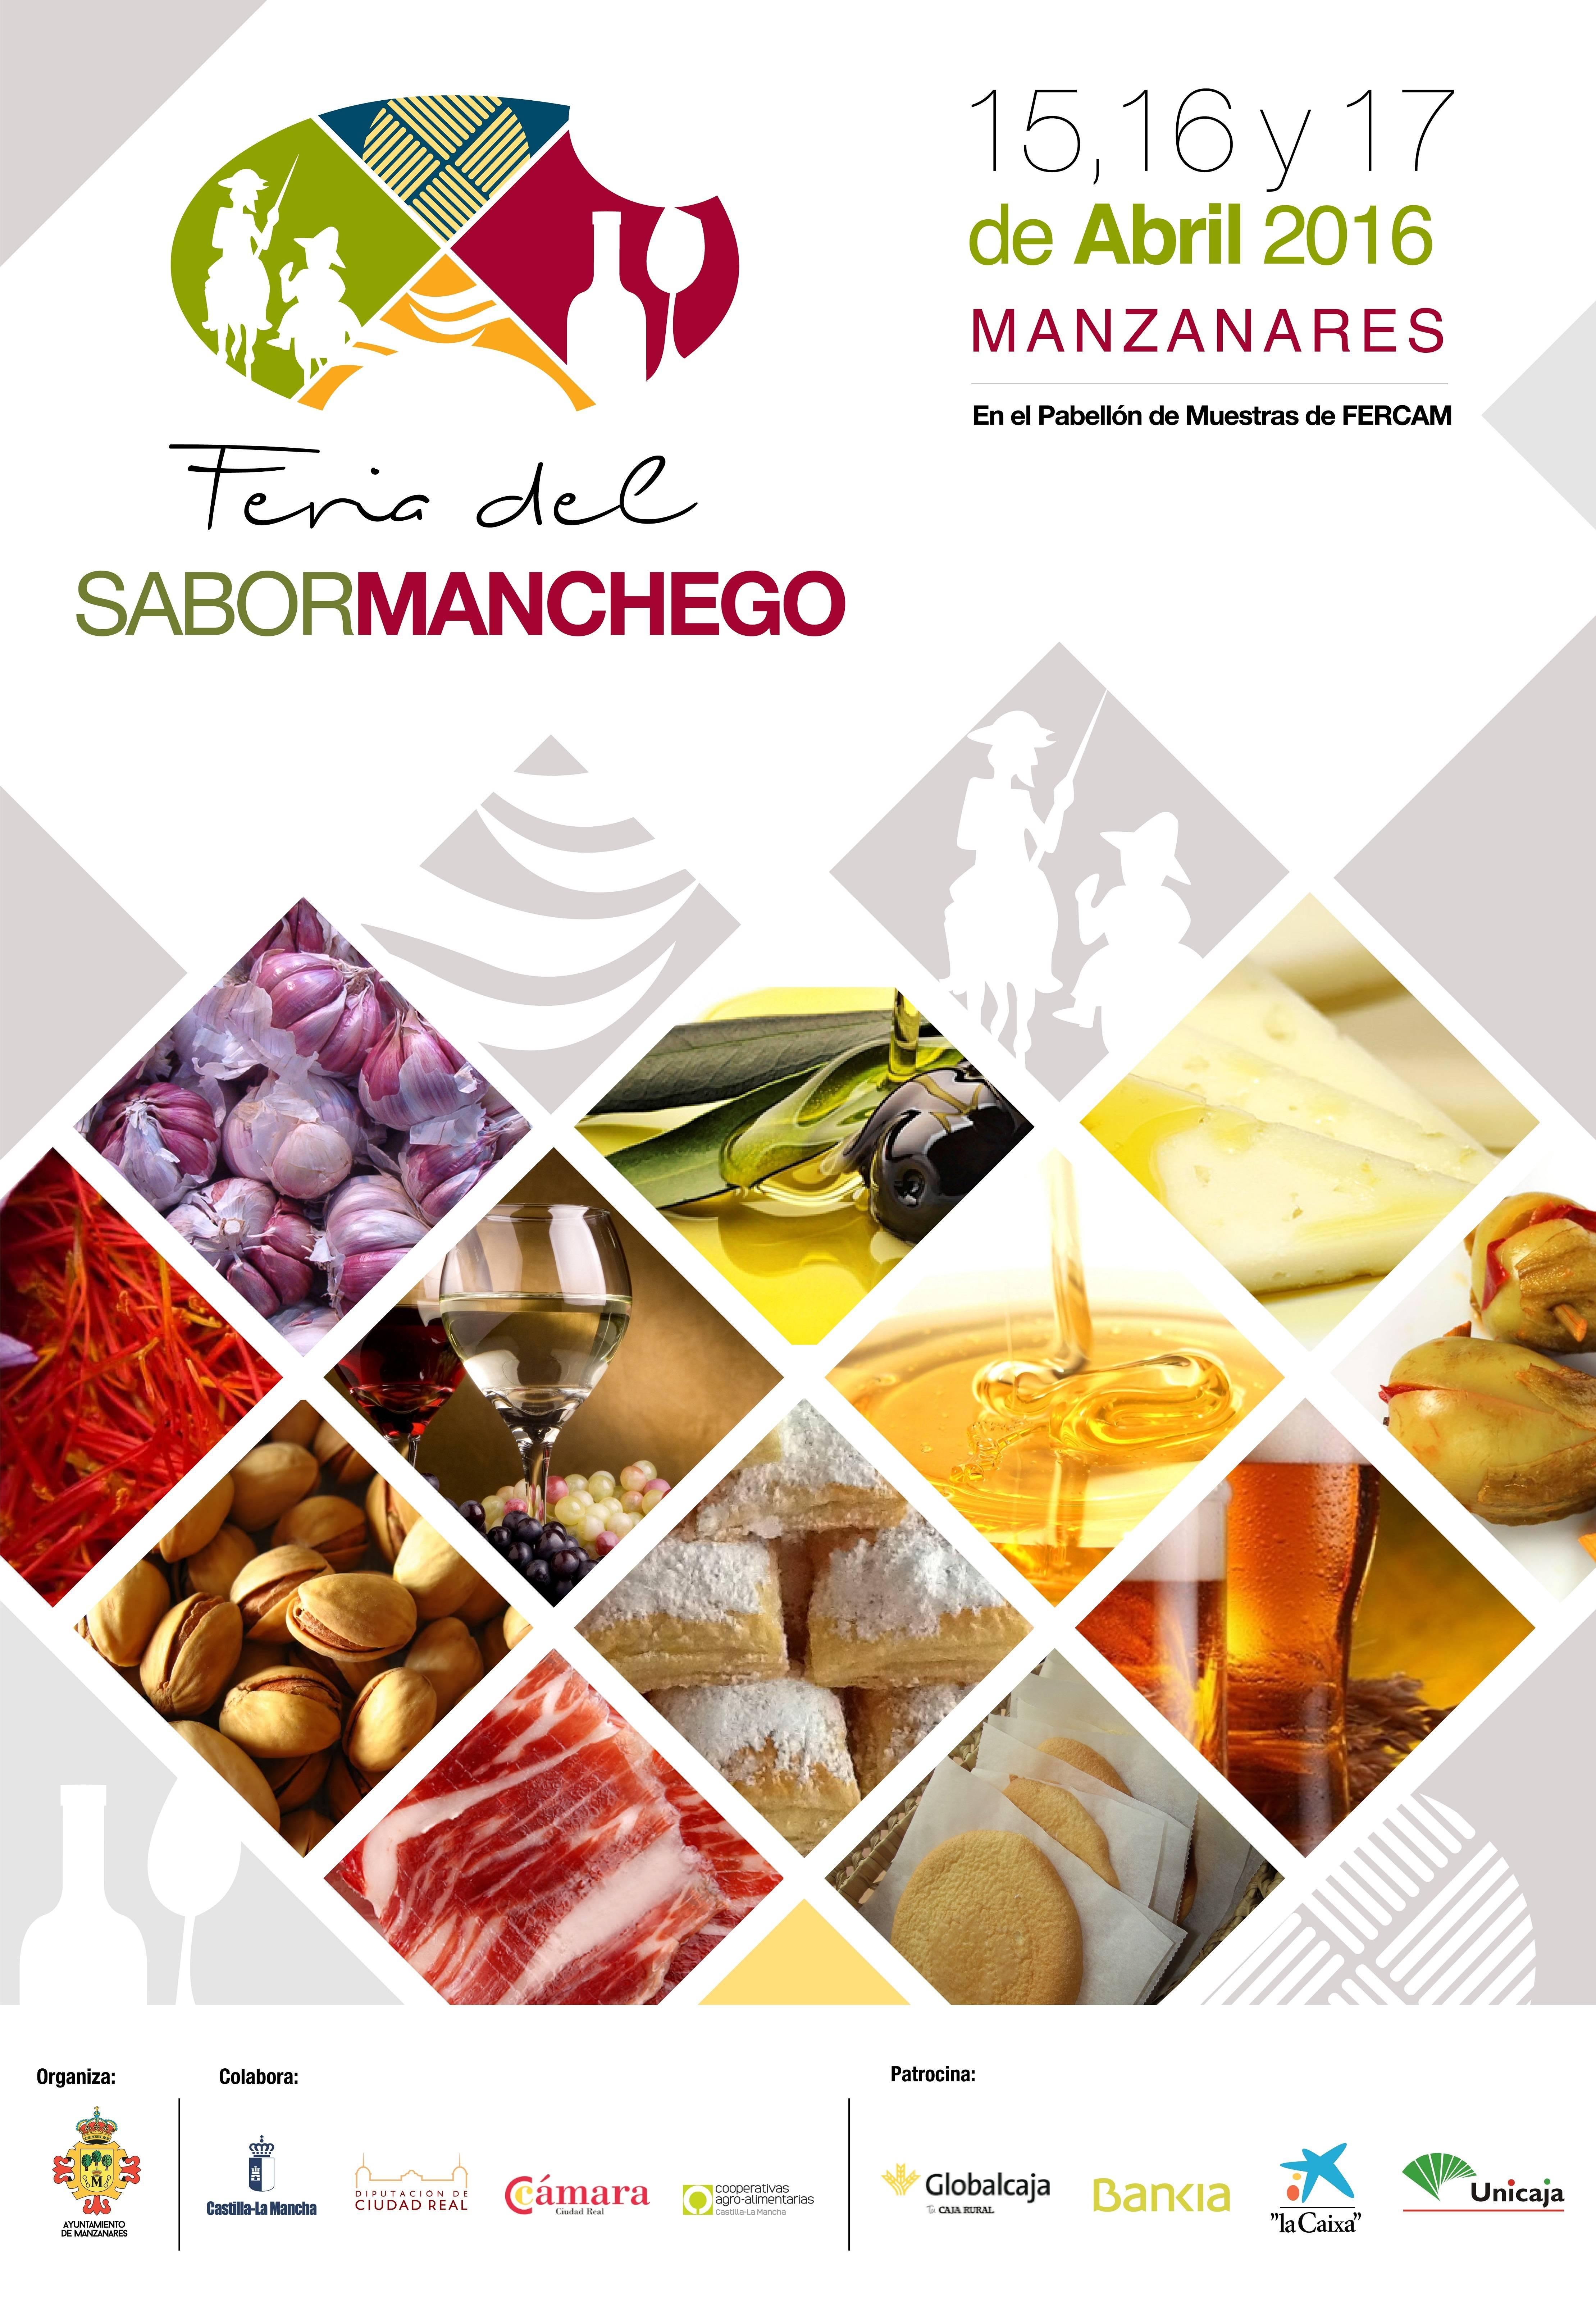 fersama feria del sabor manchego 2016 - Herencia estará representada en la Feria del Sabor Manchego